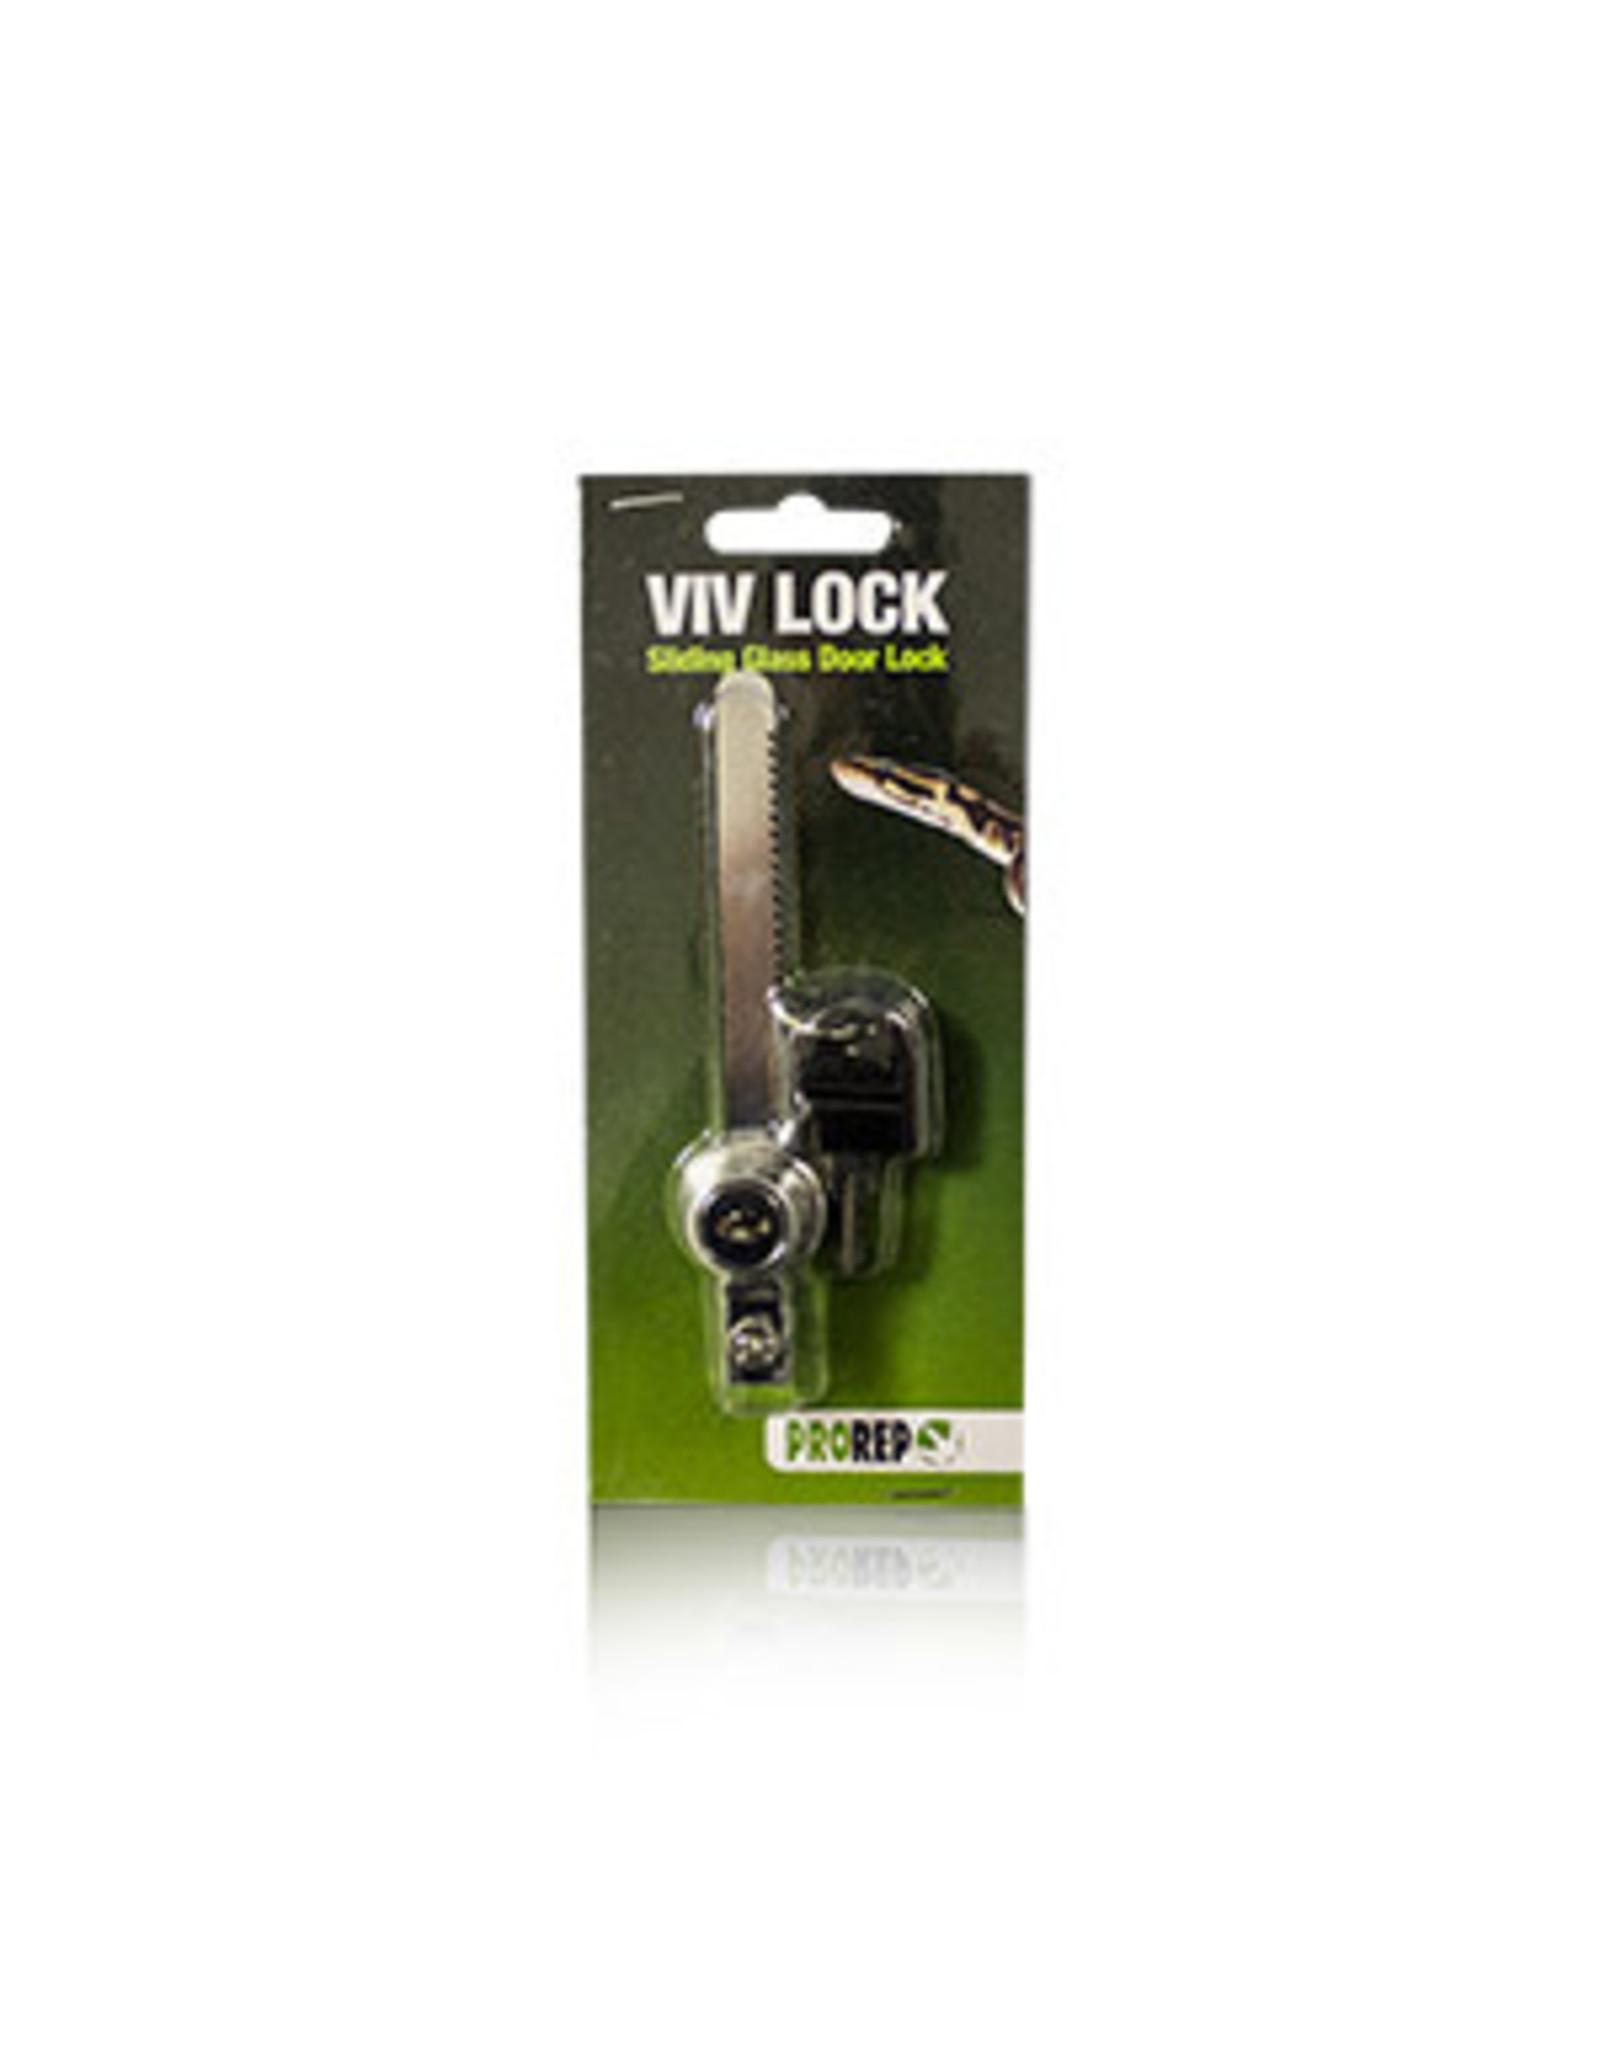 Pro Rep PR Viv Lock Same Key Extra Long